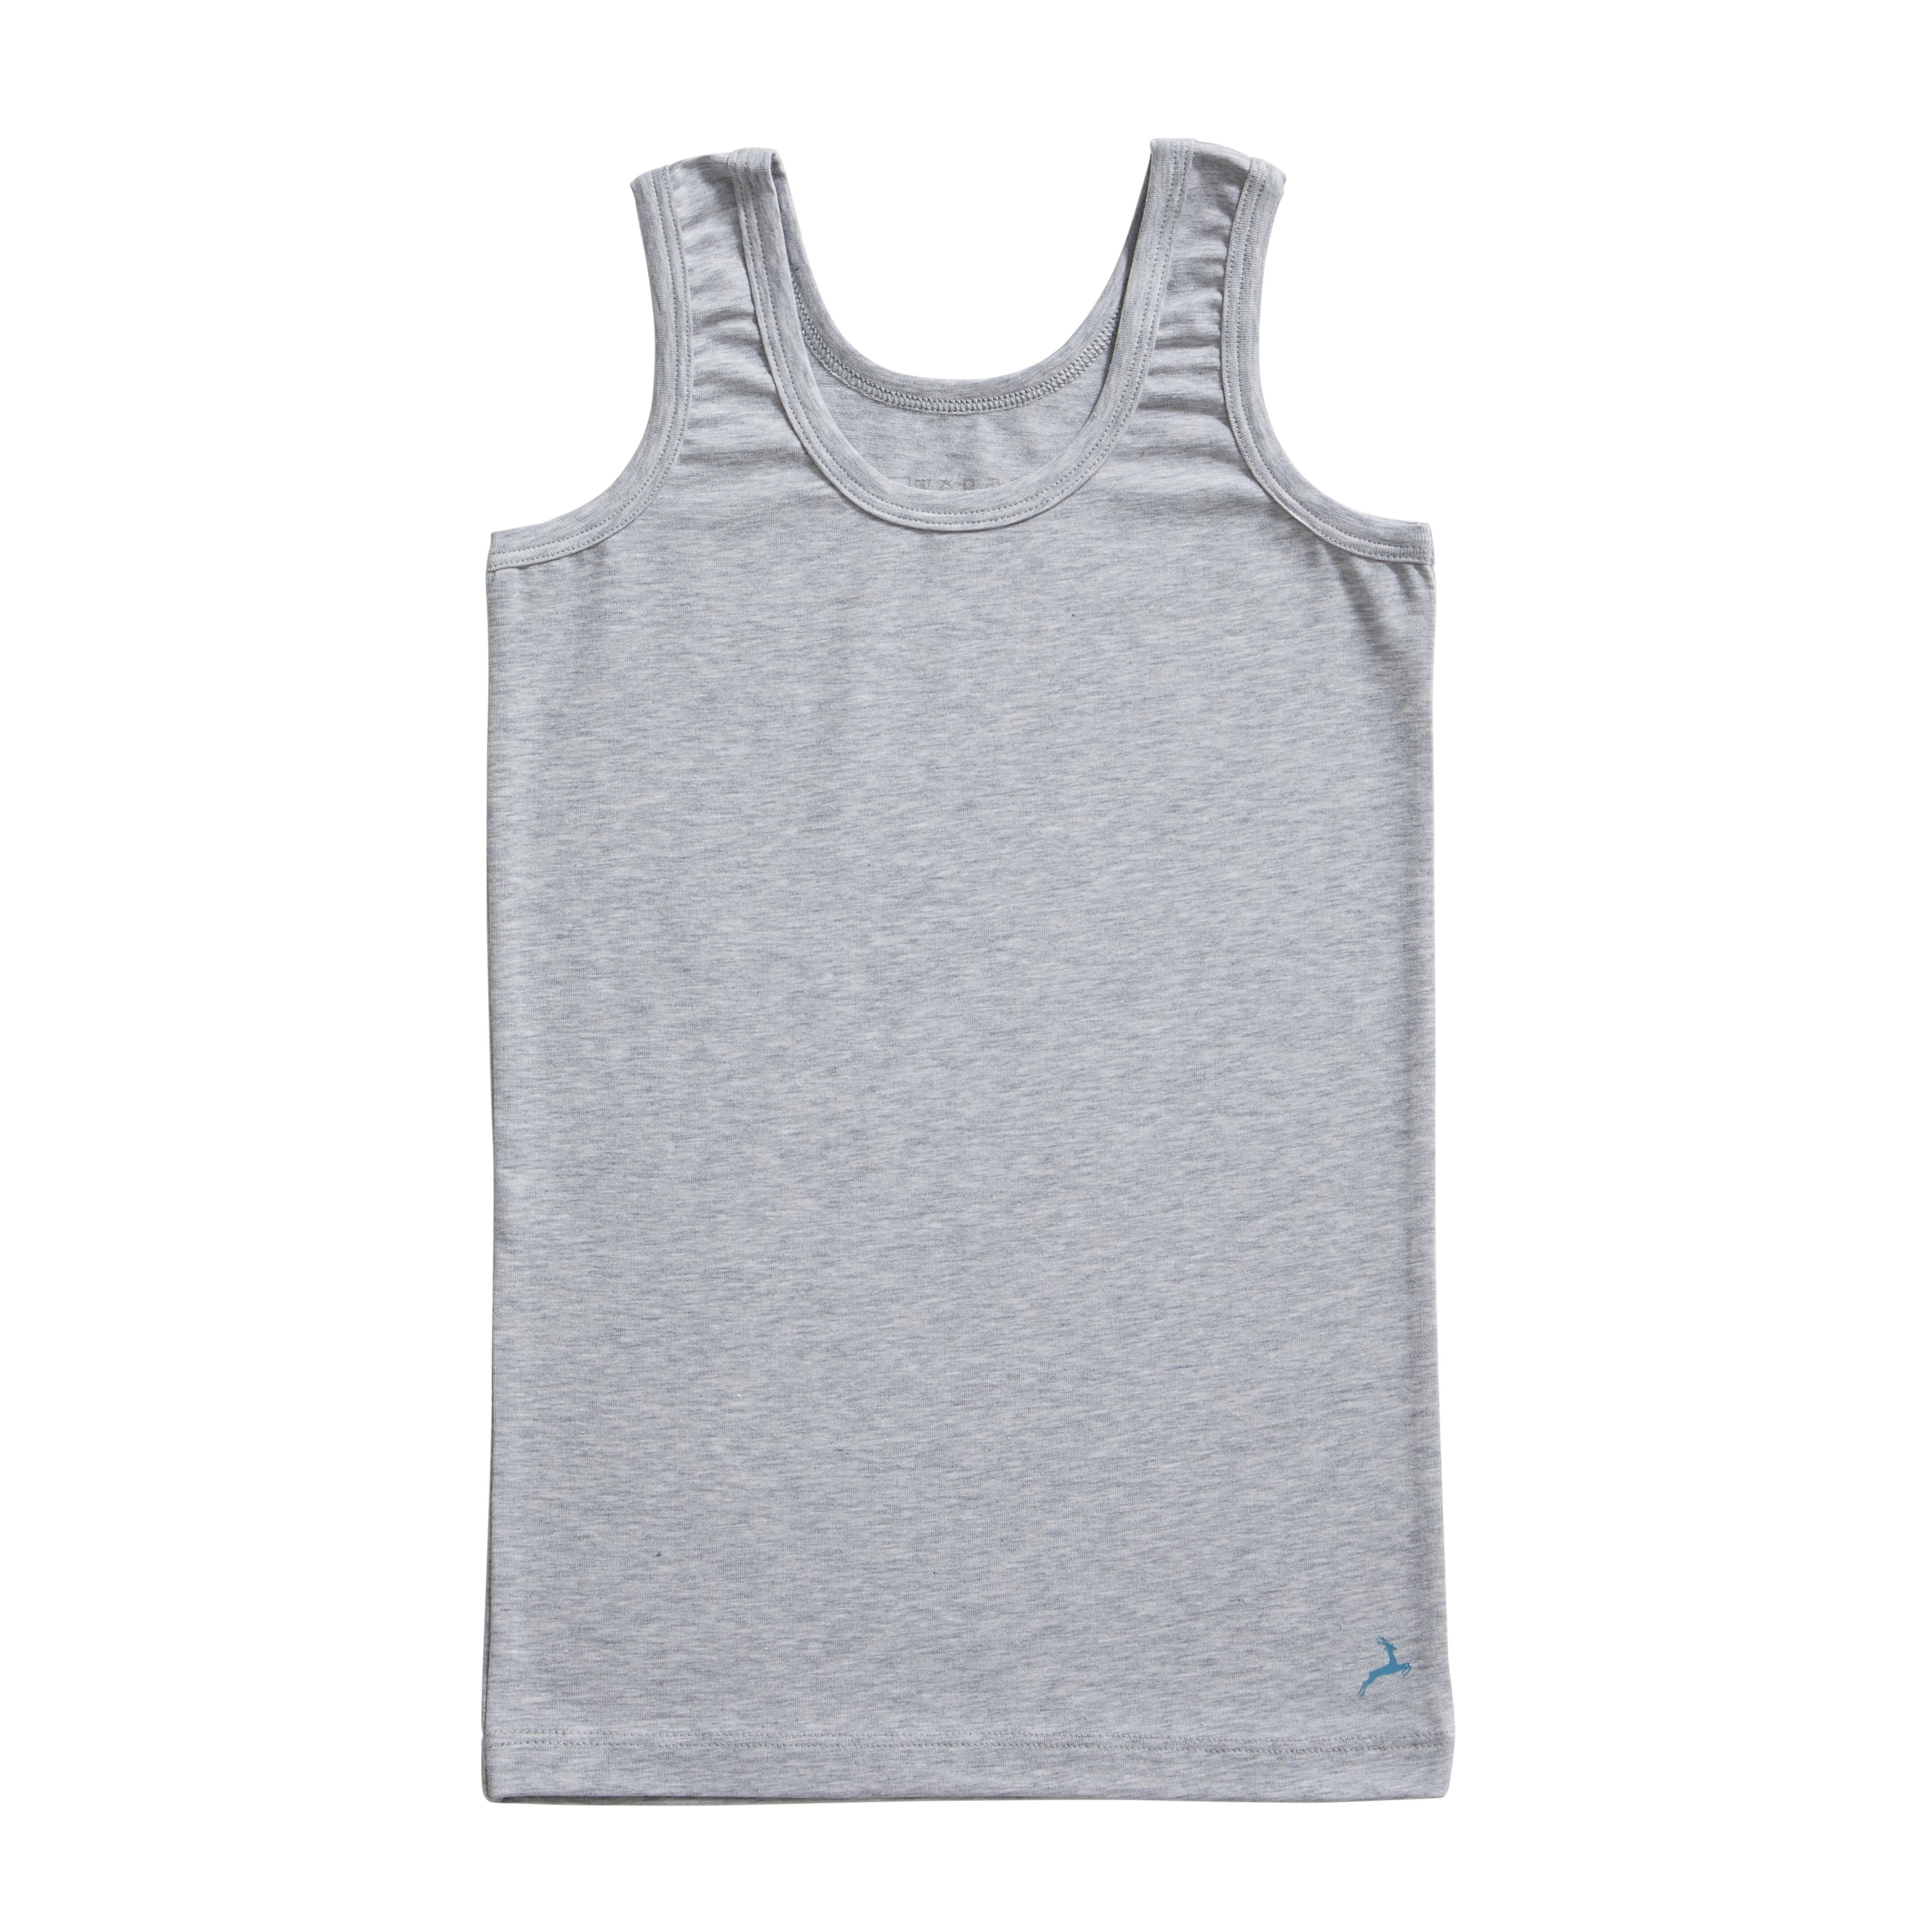 Ten Cate Kids Boys Shirt grey melee